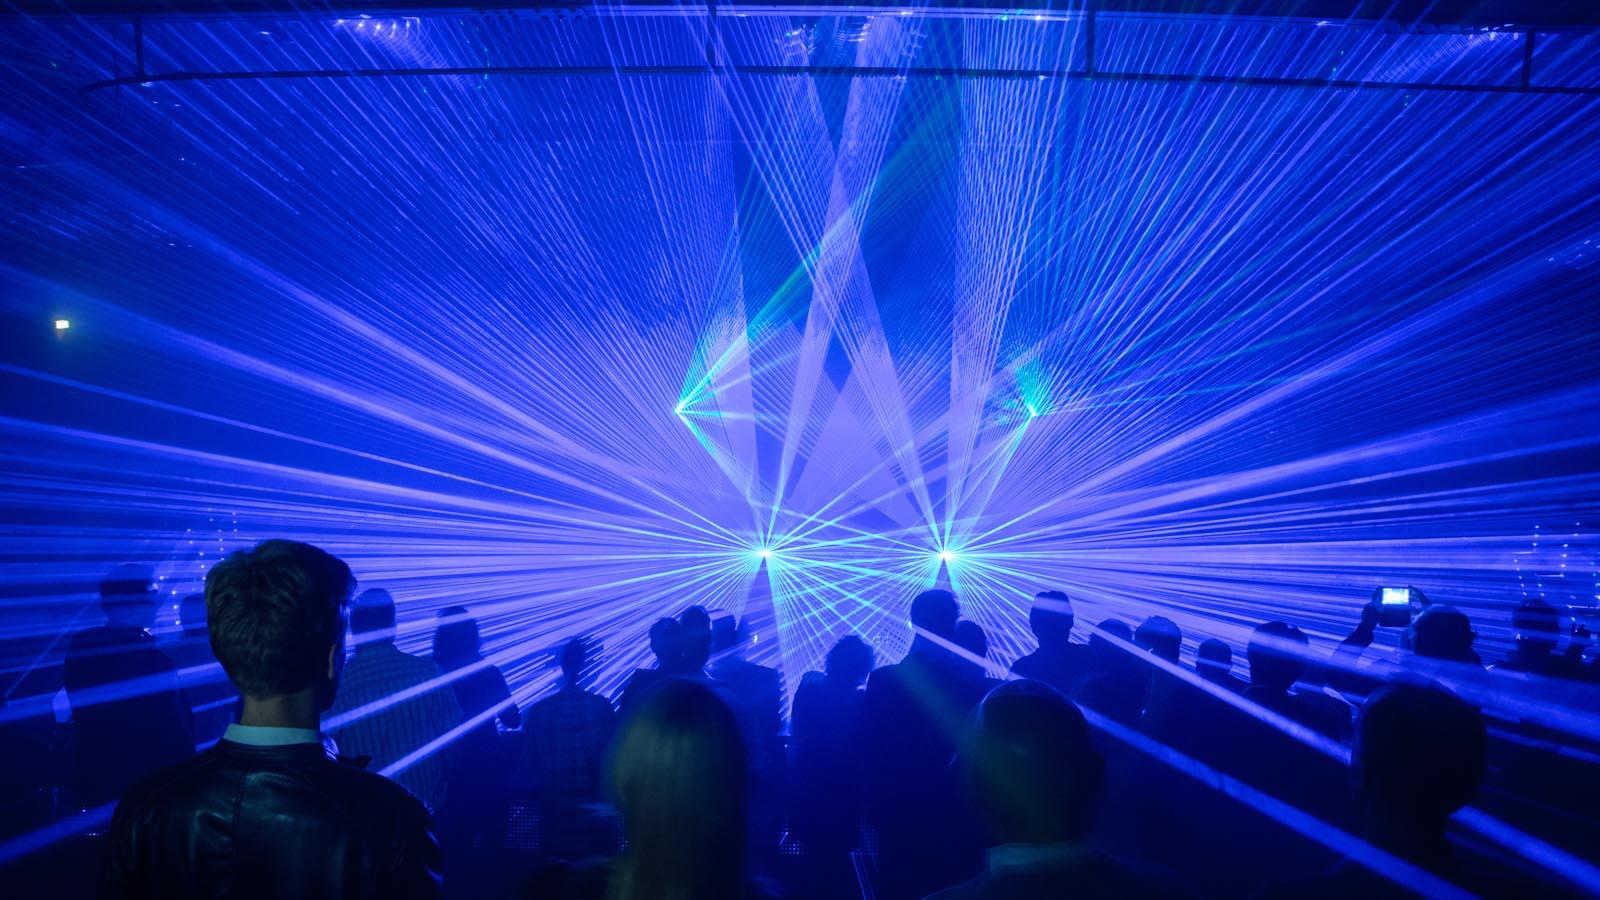 04_Columbia Halle_Lasershow_16_9_IMGP3524